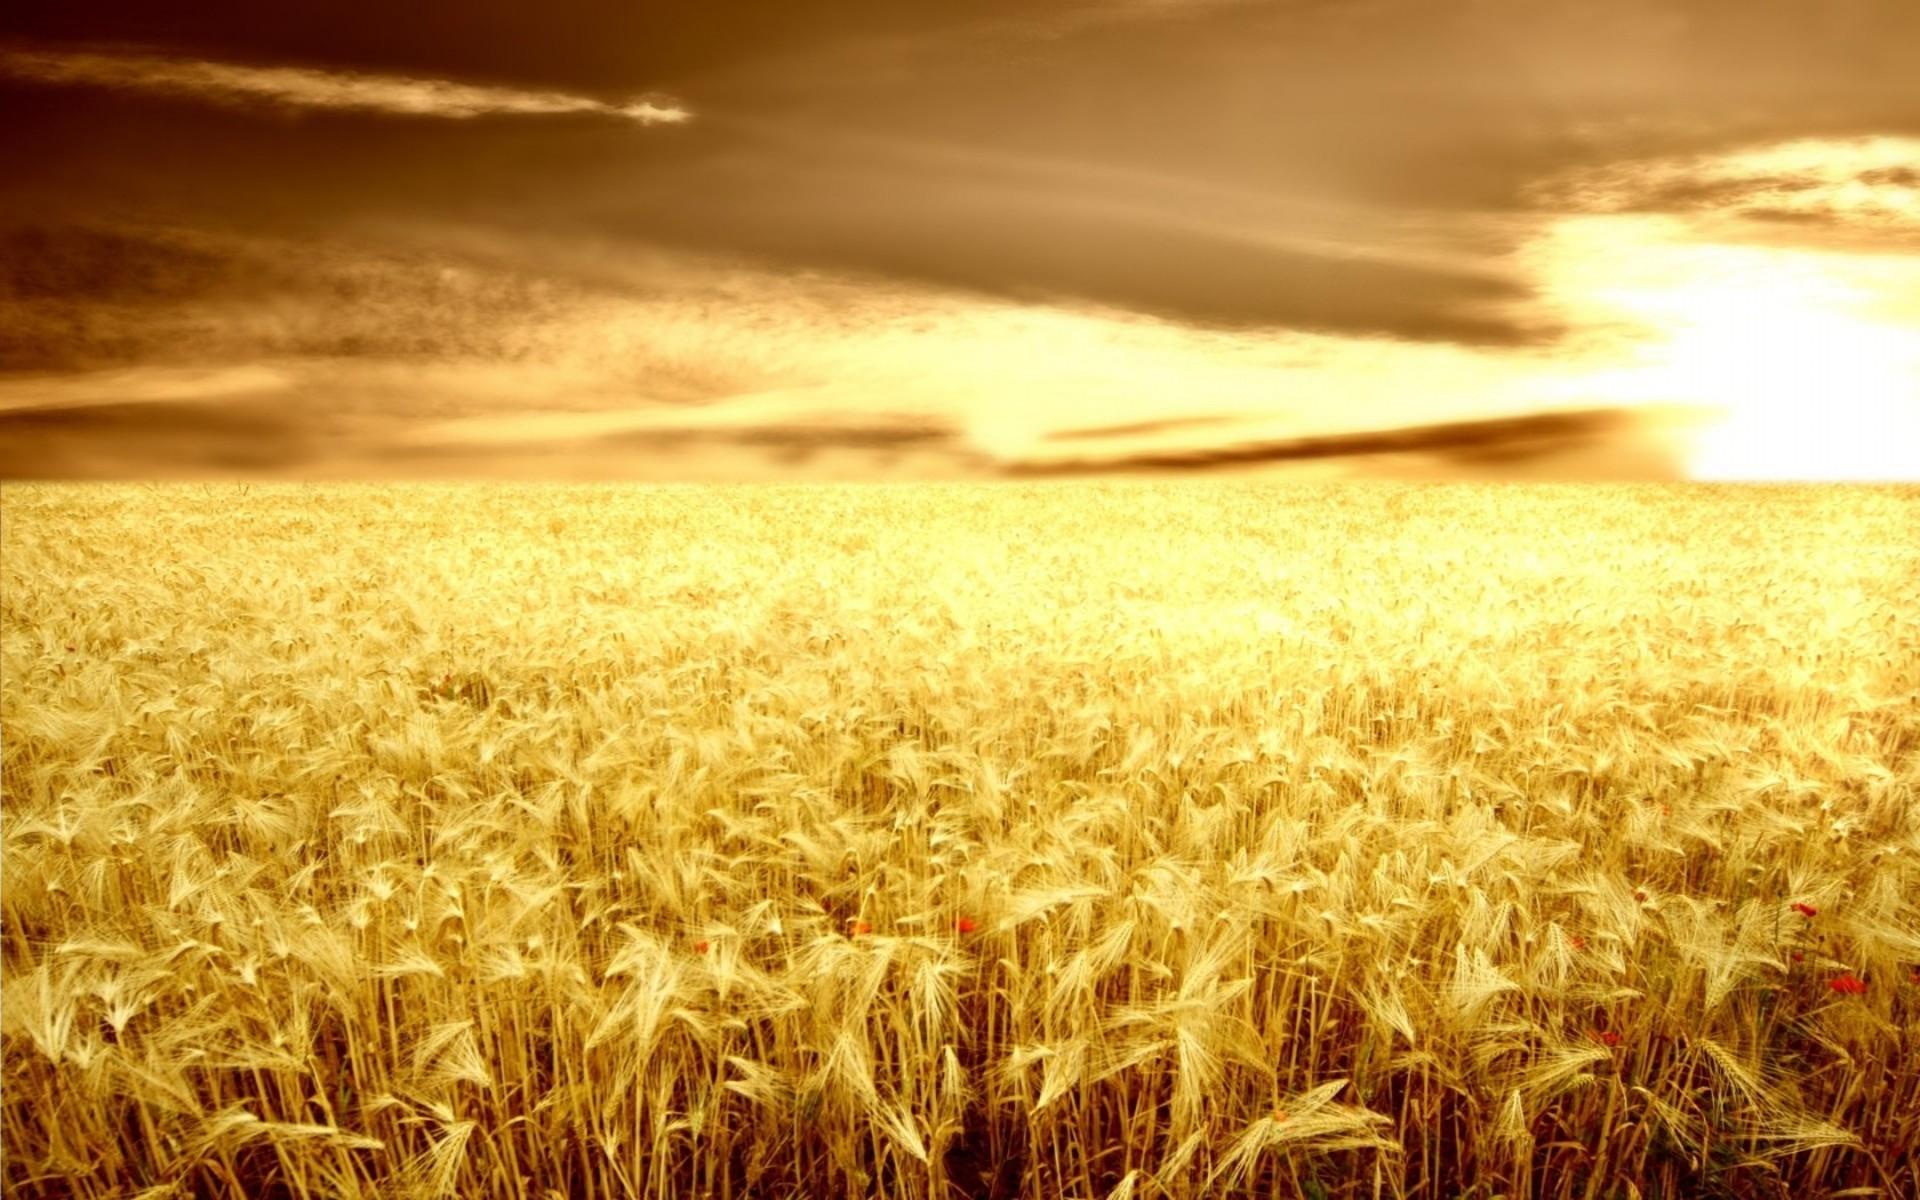 Golden Fields Wallpaper Landscape Nature Wallpapers in jpg format